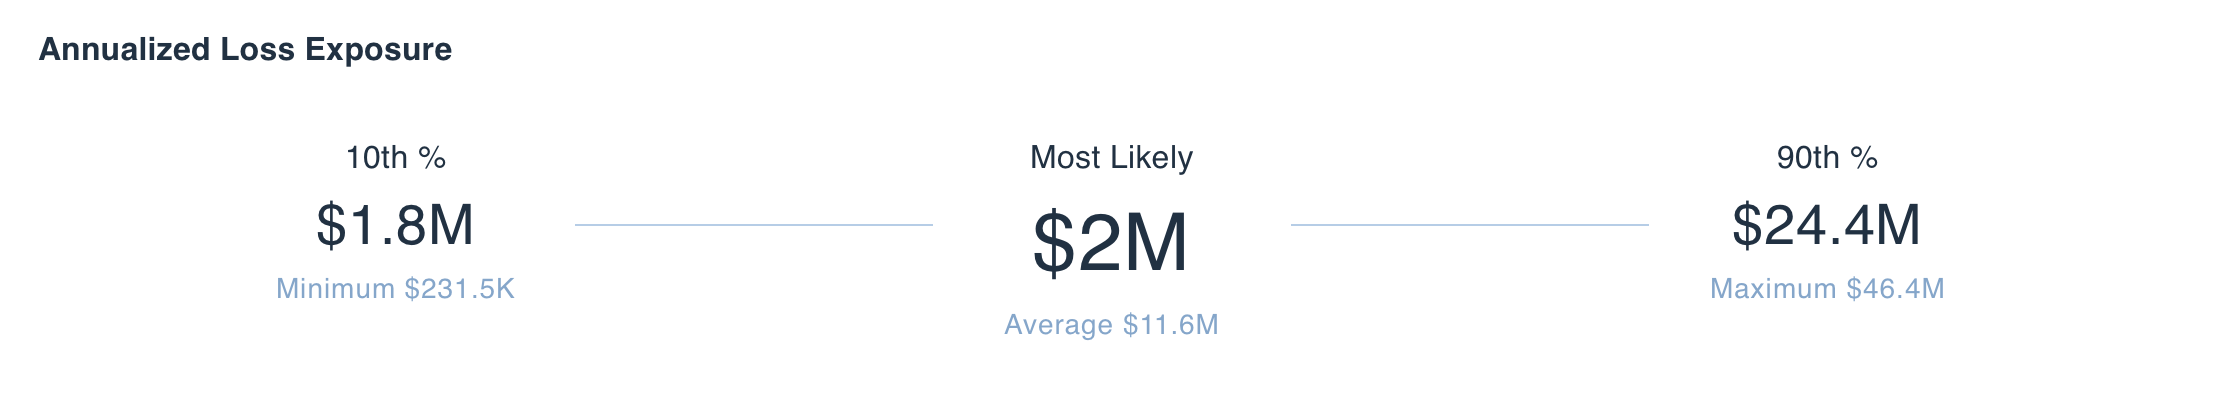 RiskLens Platform - Annualized Loss Exposure